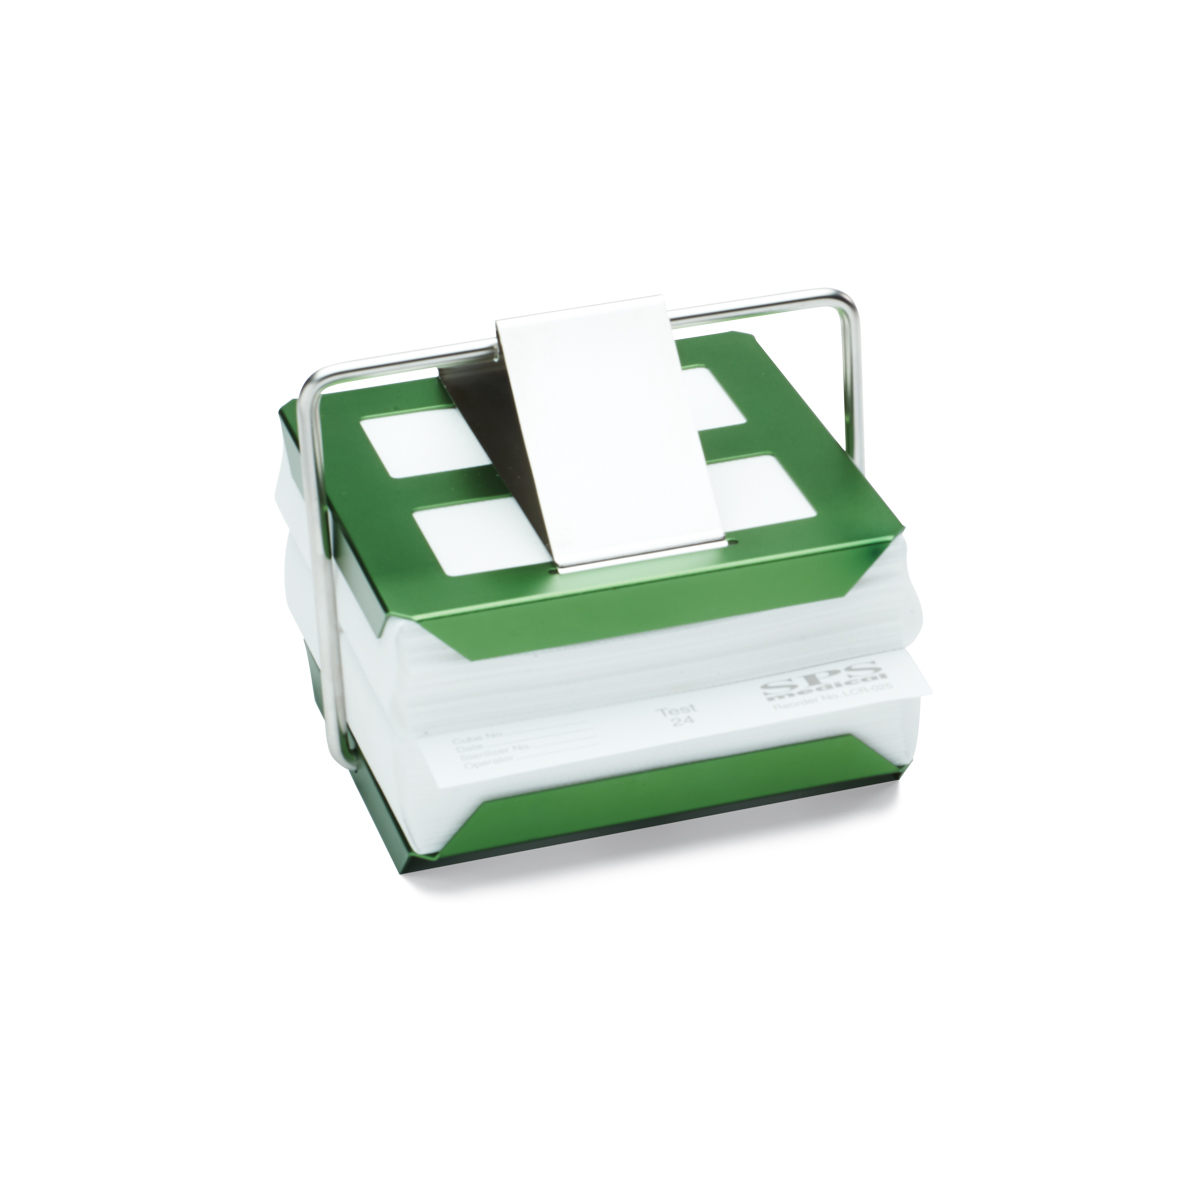 Lantor Cube® Metal Clamp Image